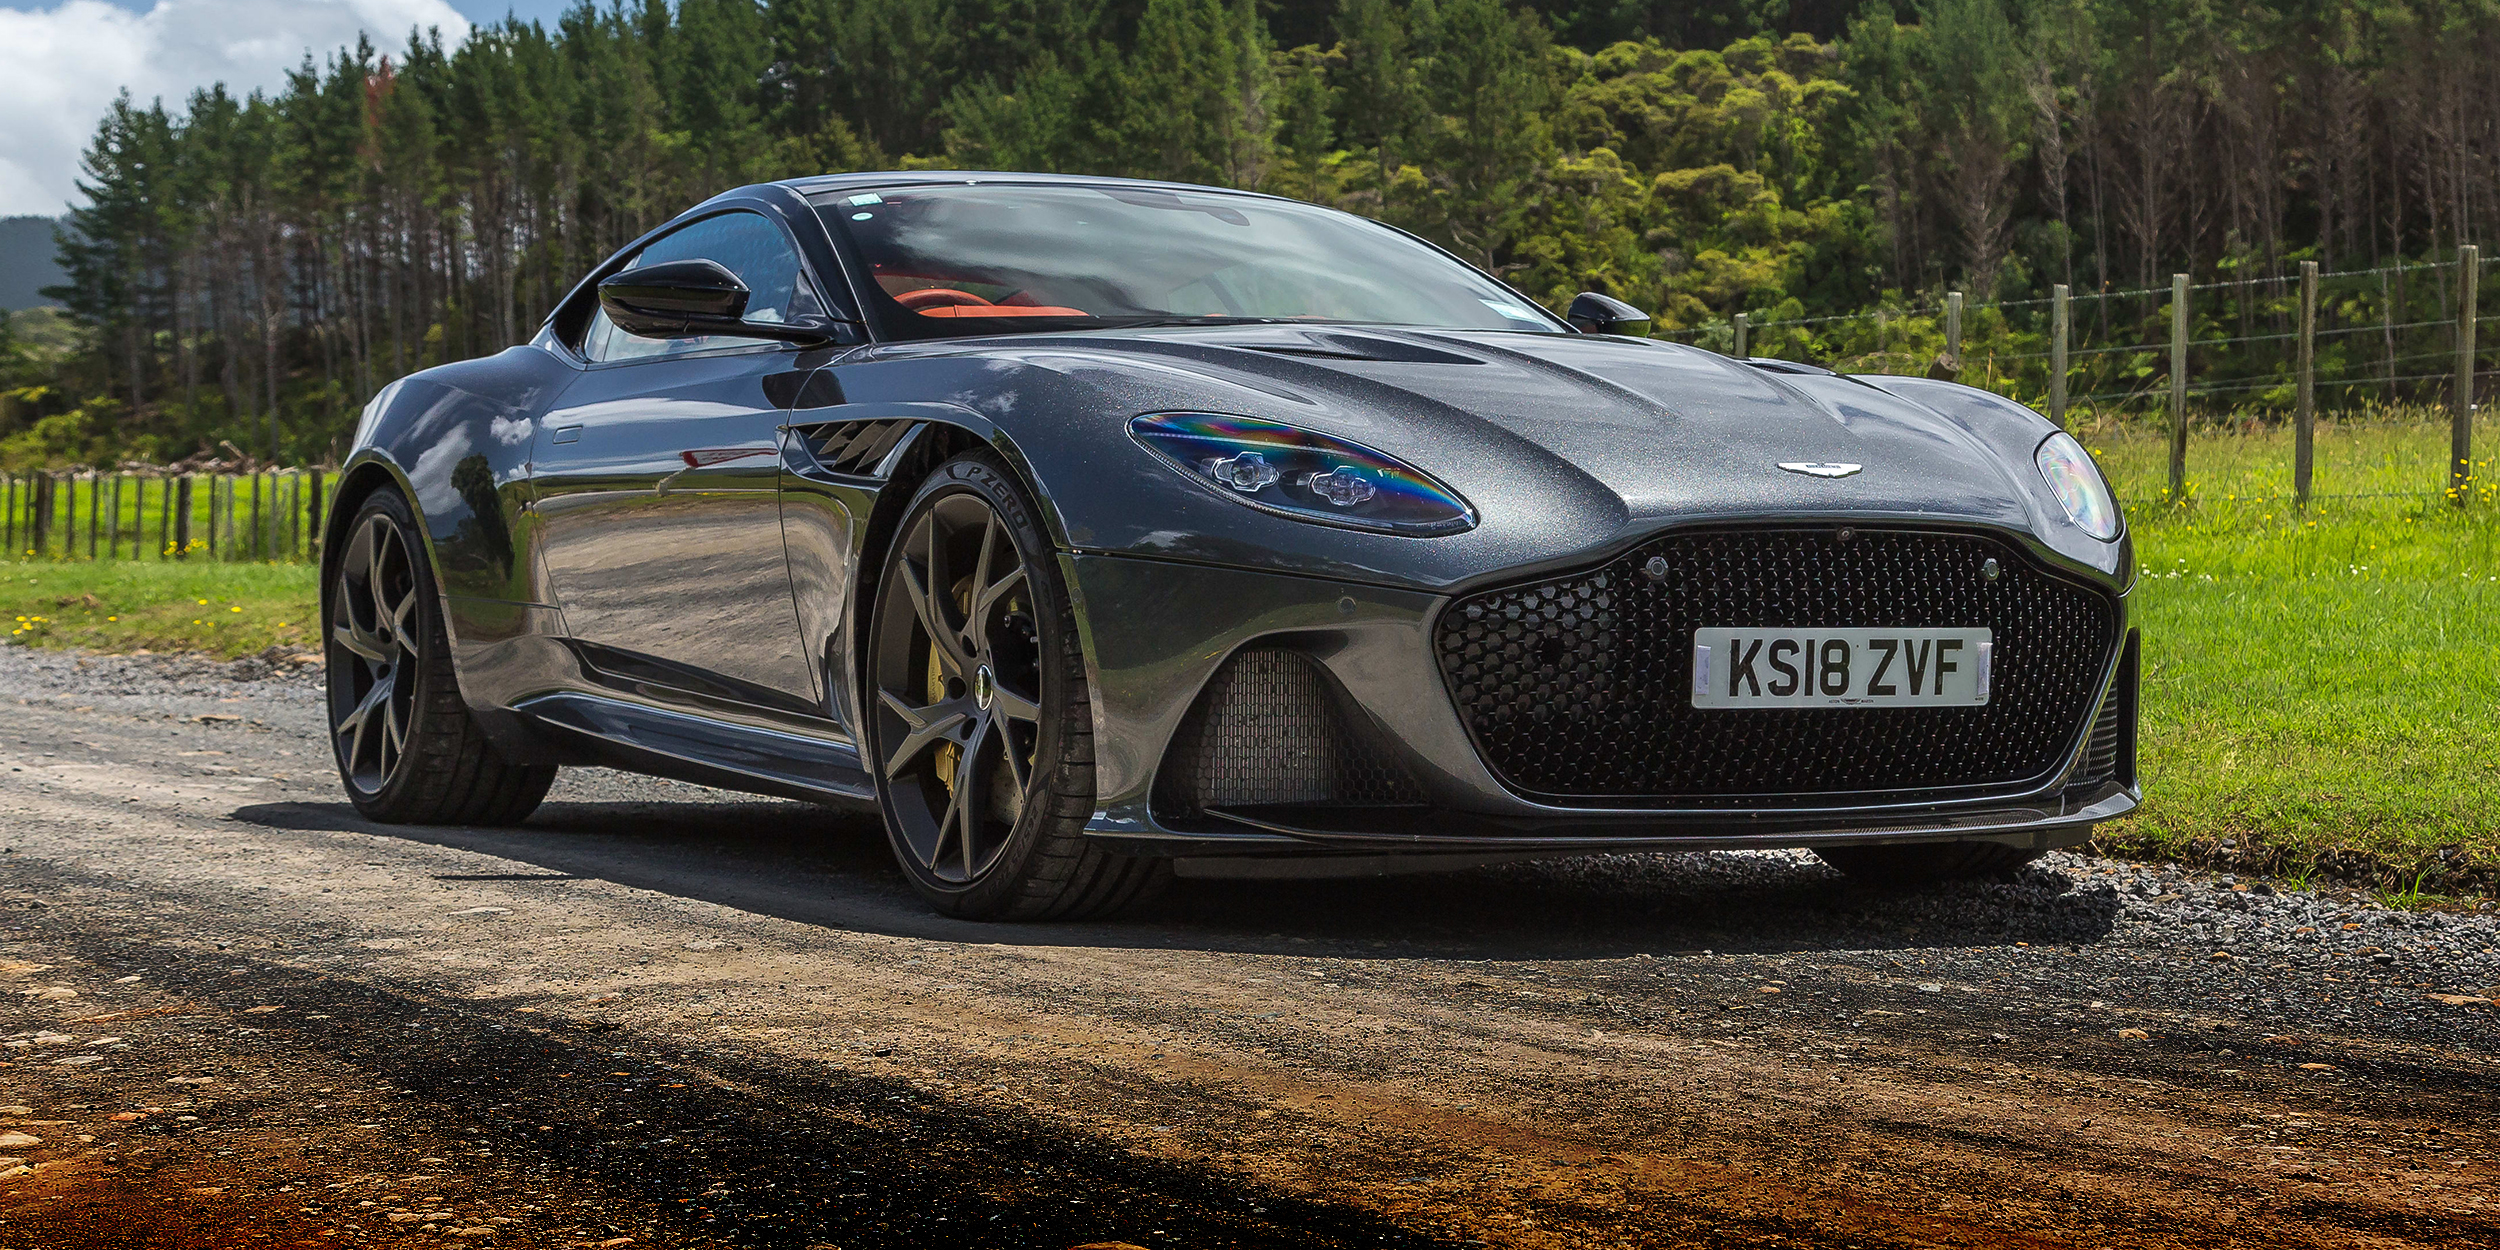 2019 Aston Martin Dbs Superleggera Review Caradvice